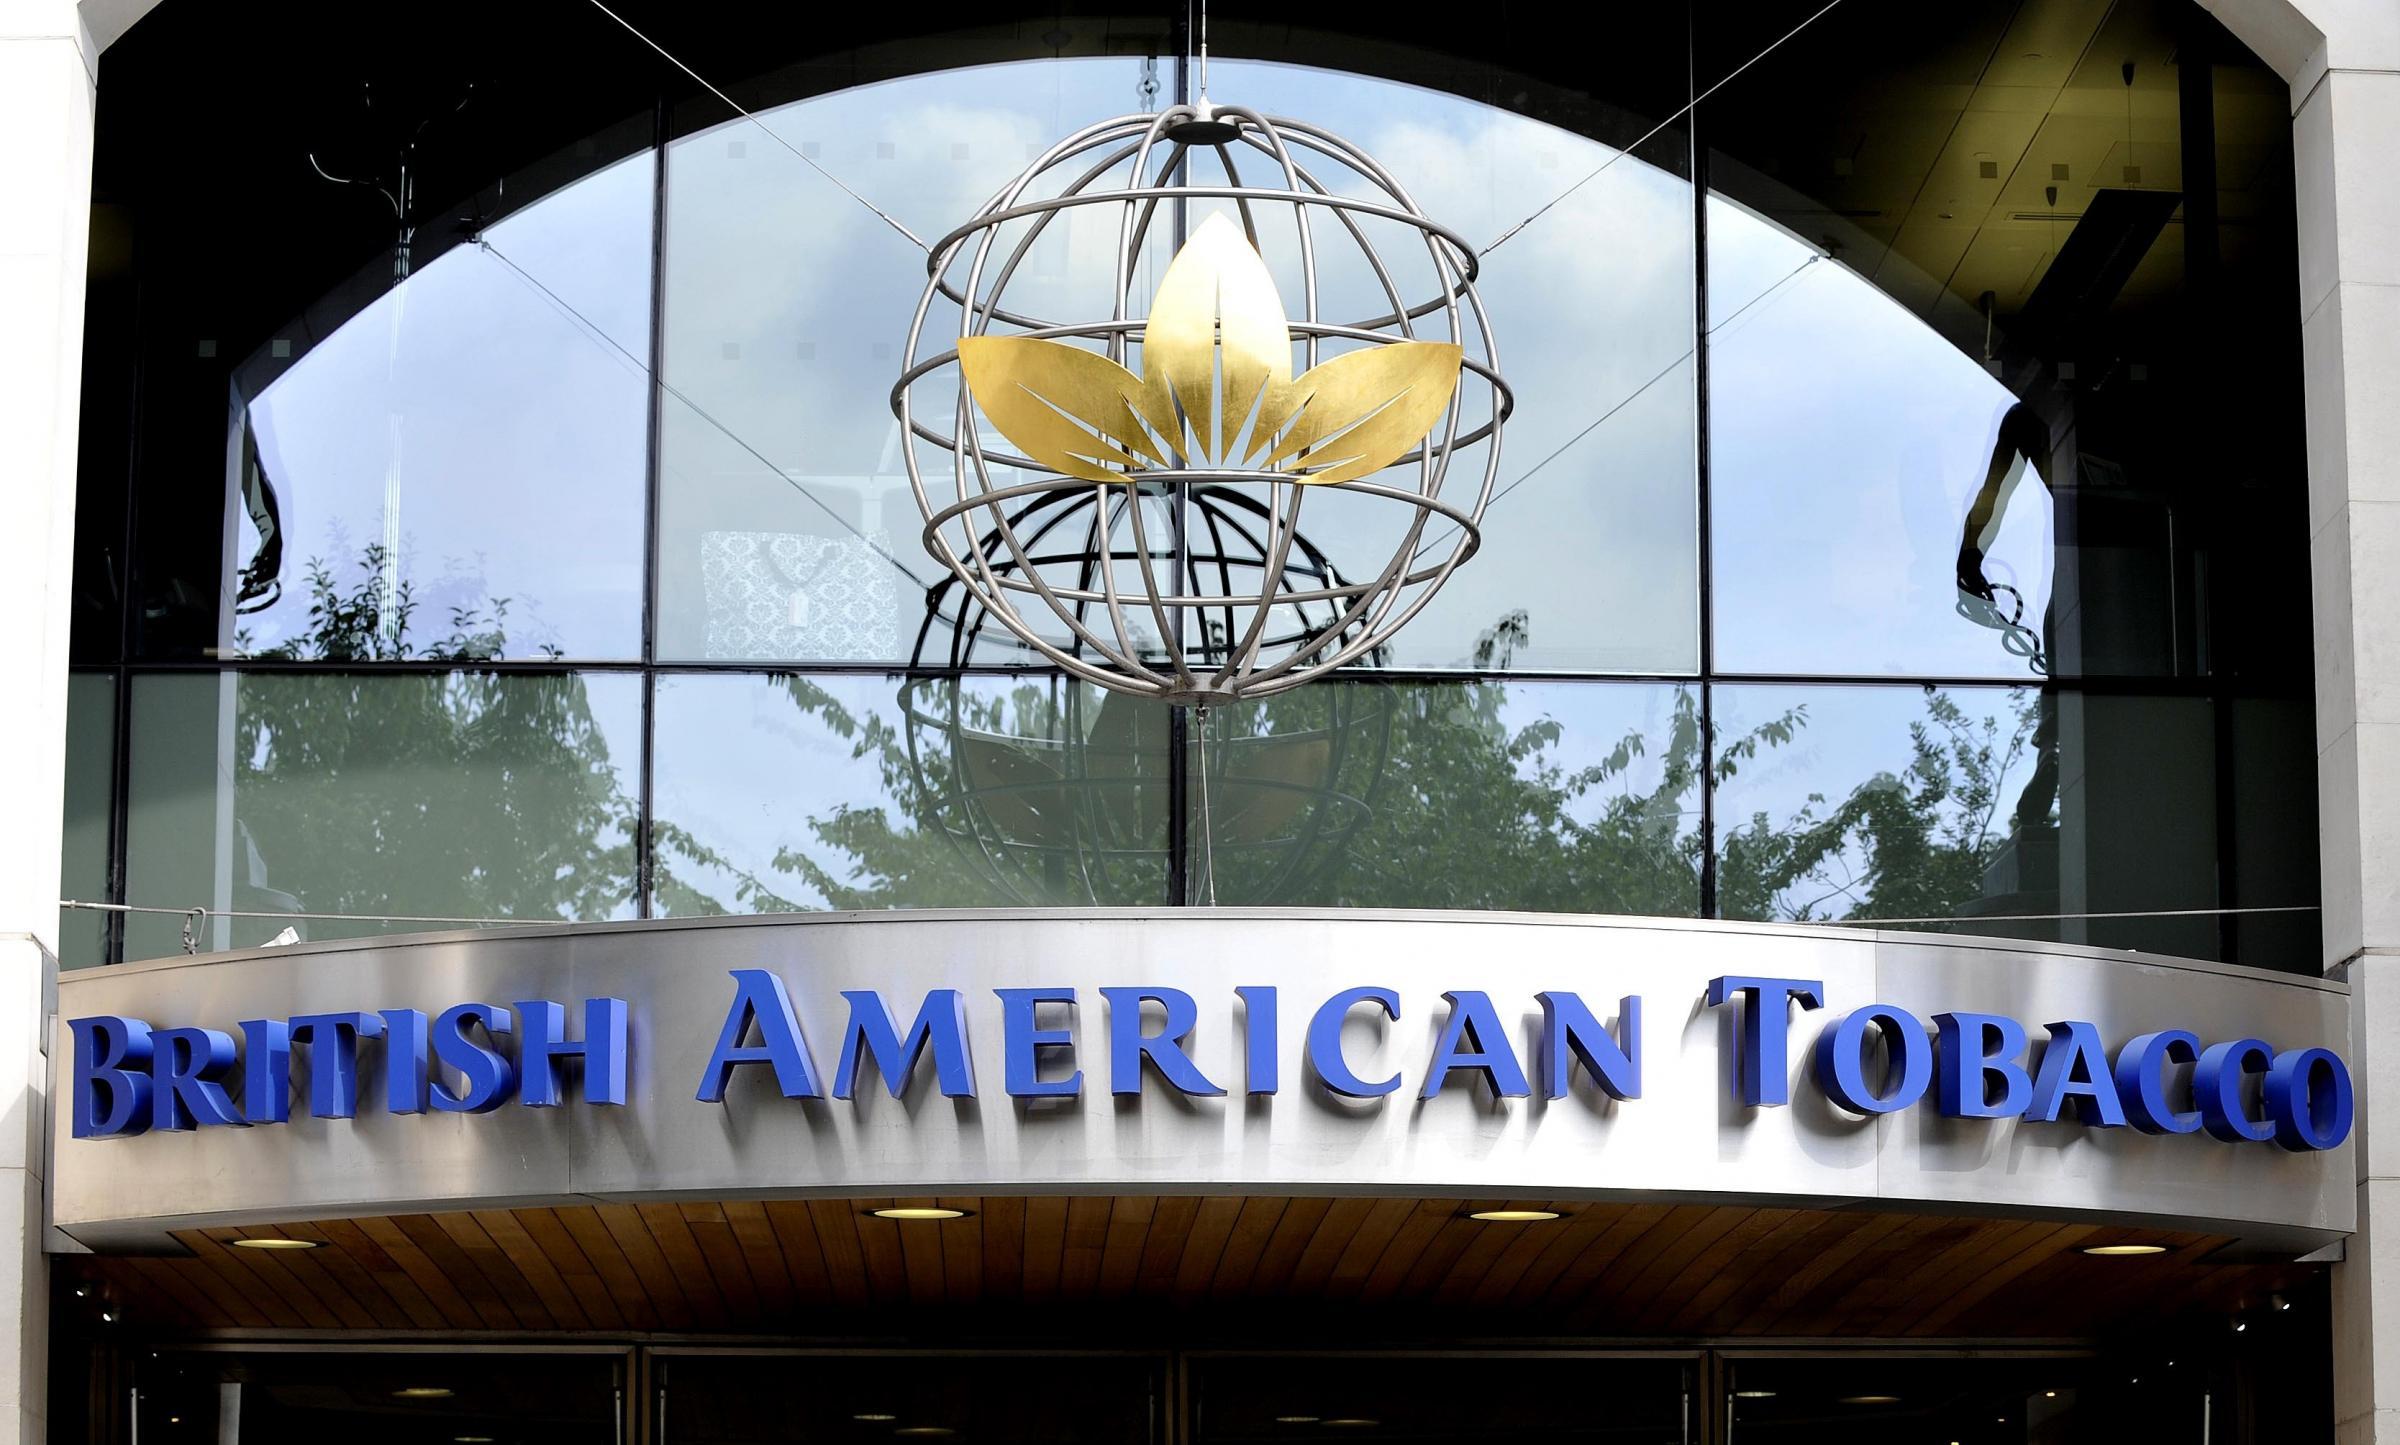 british american tobacco bangladesh essay British american tobacco company profile - swot analysis: british american tobacco (bat) is the world's second largest international tobacco company,.